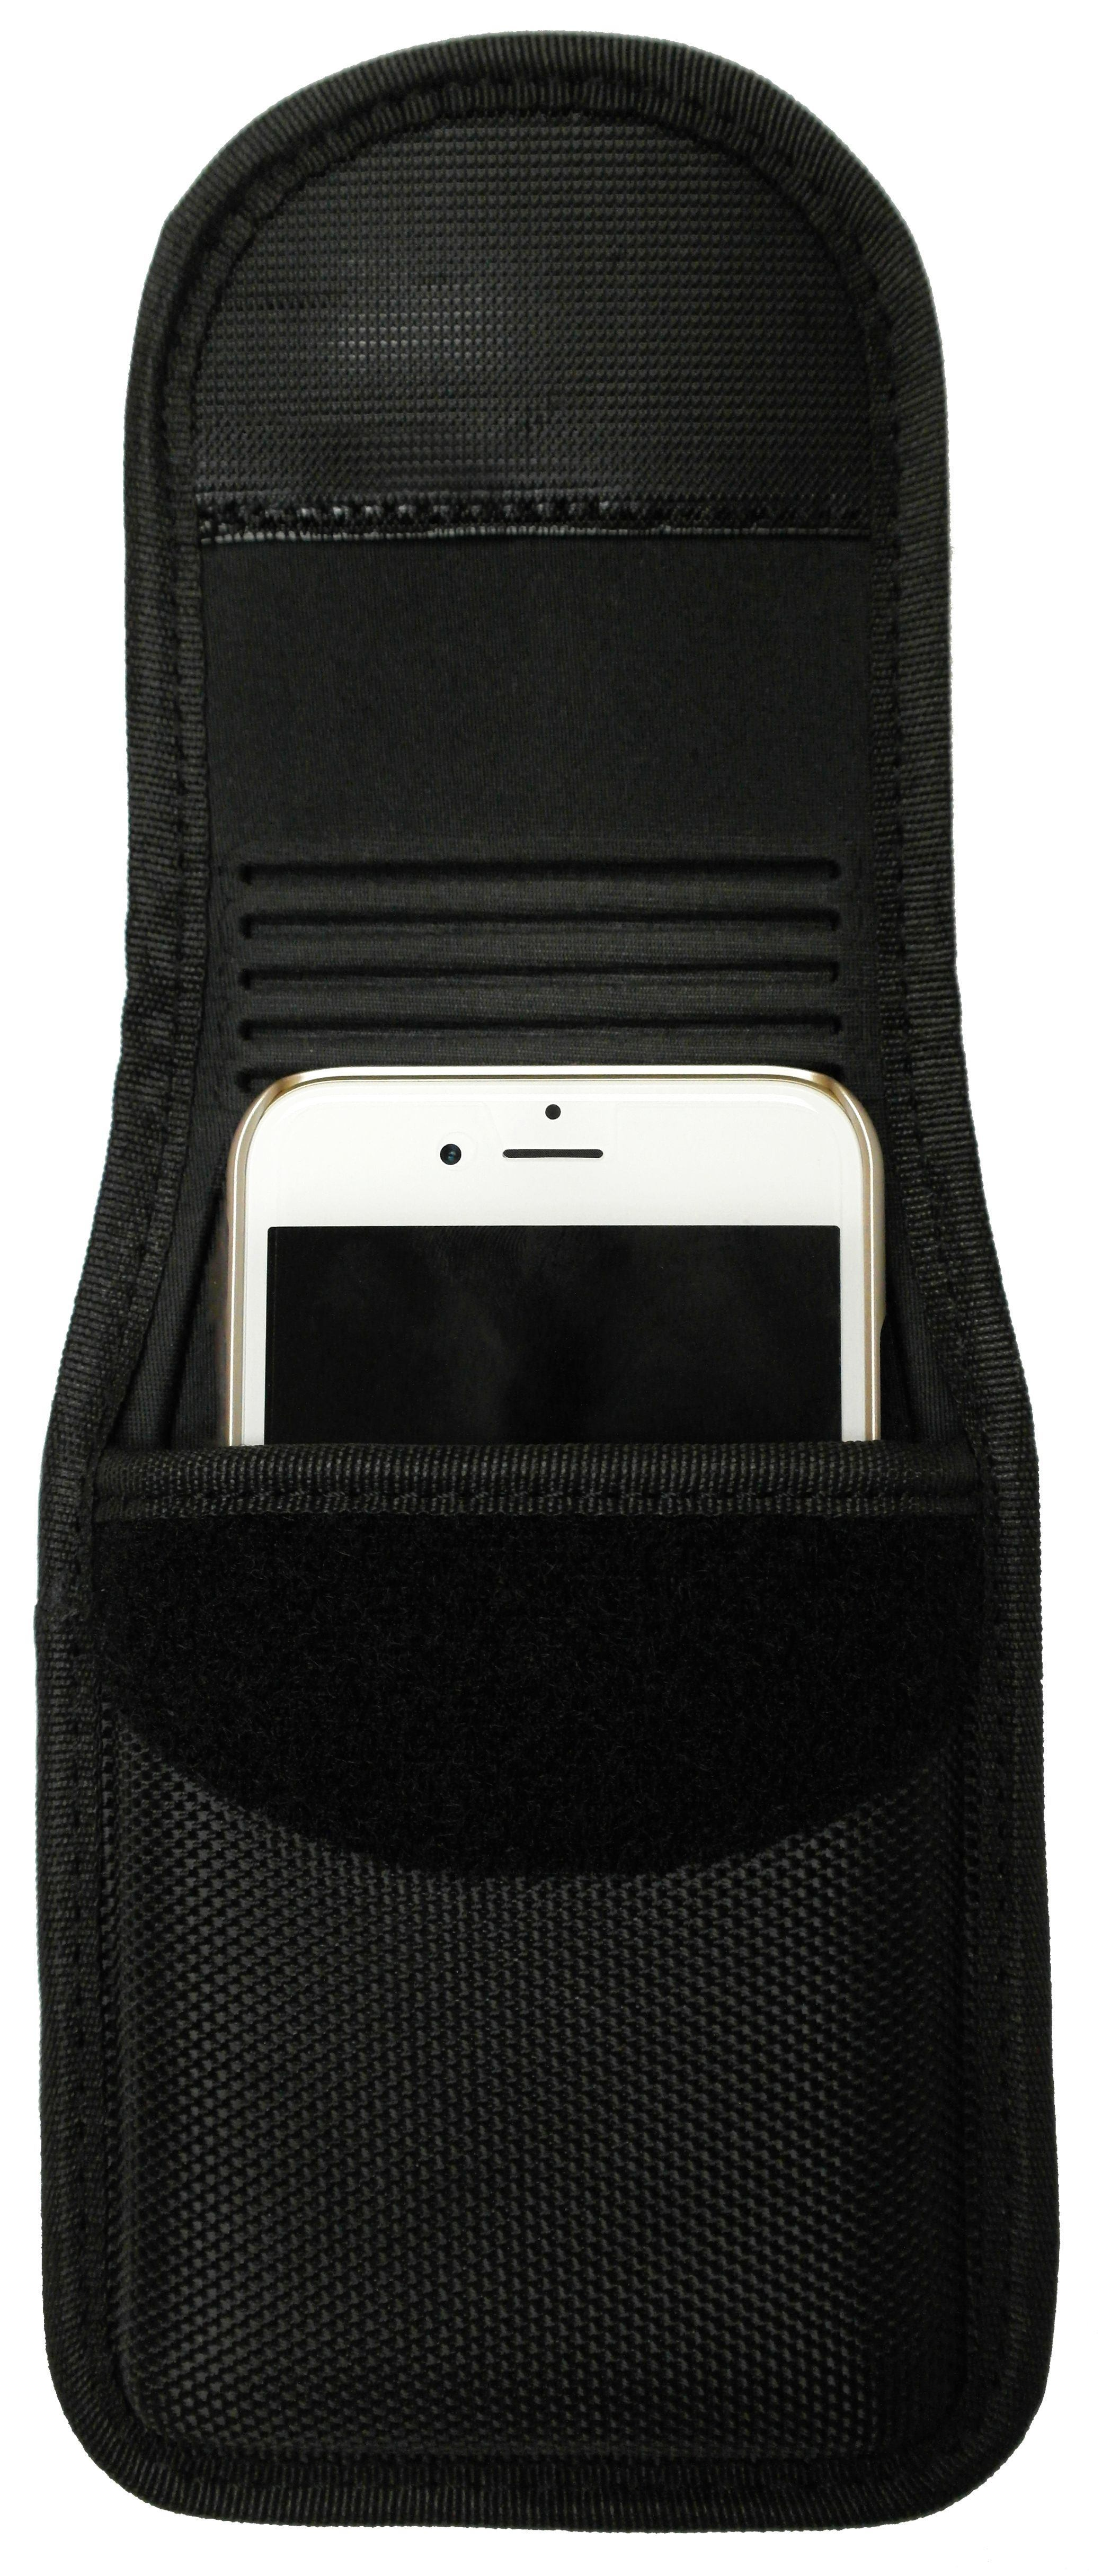 Smart Phone Case, 2XL, iPhone6 & more - Closed - Ballistic-Hero's Pride